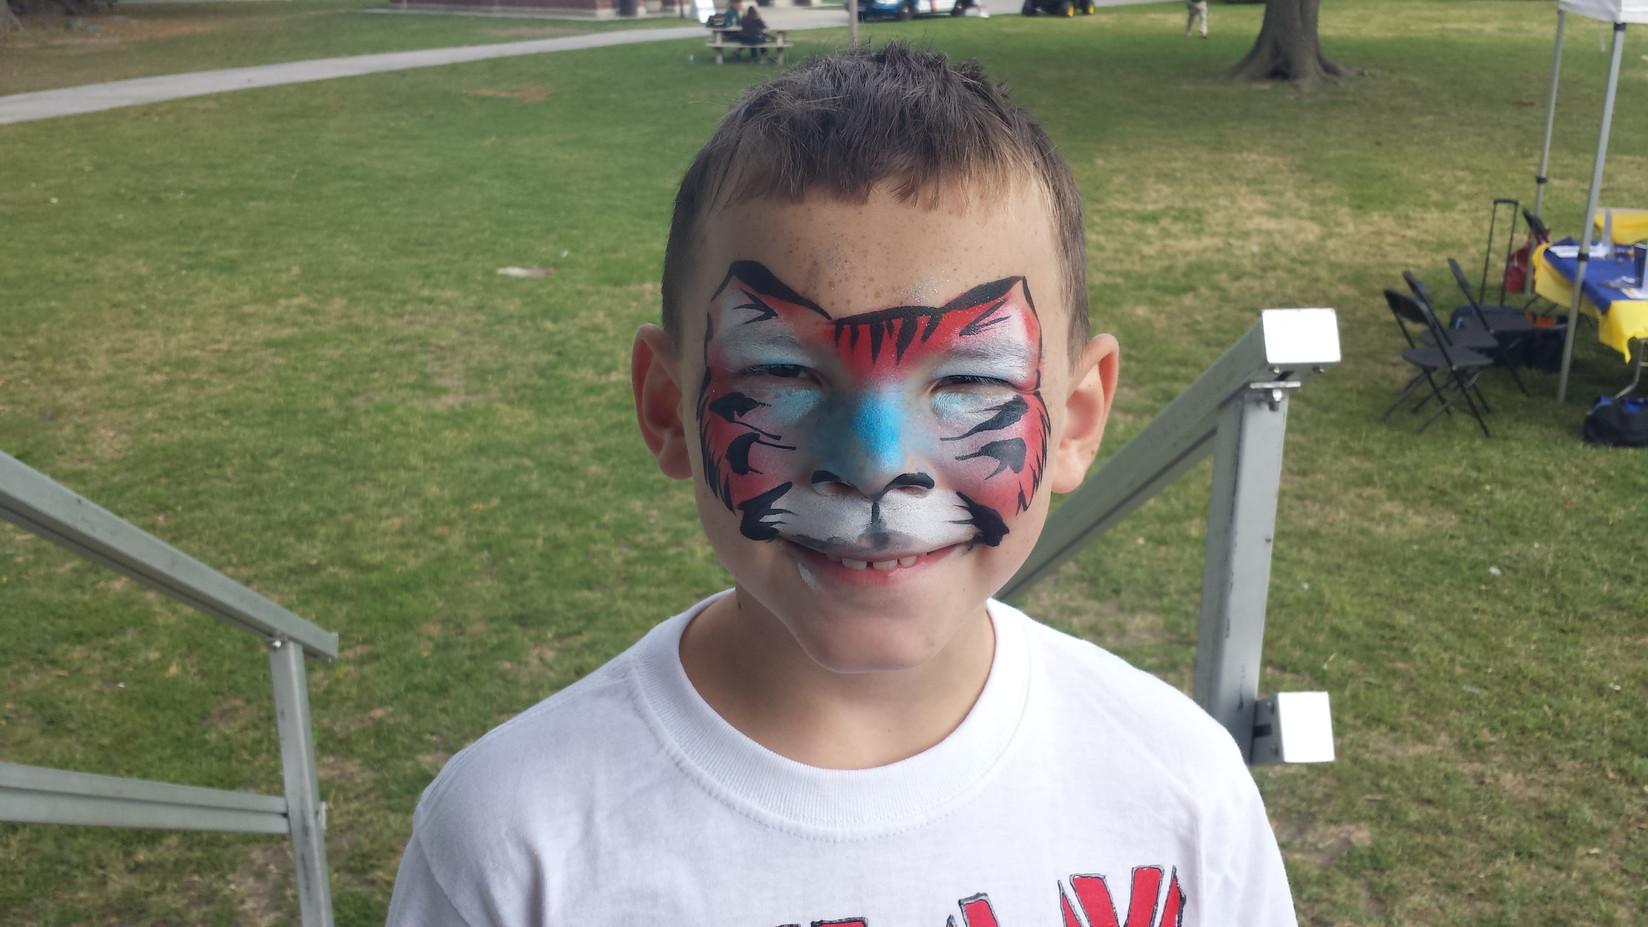 Kids-Animal-Face-Paint.jpg